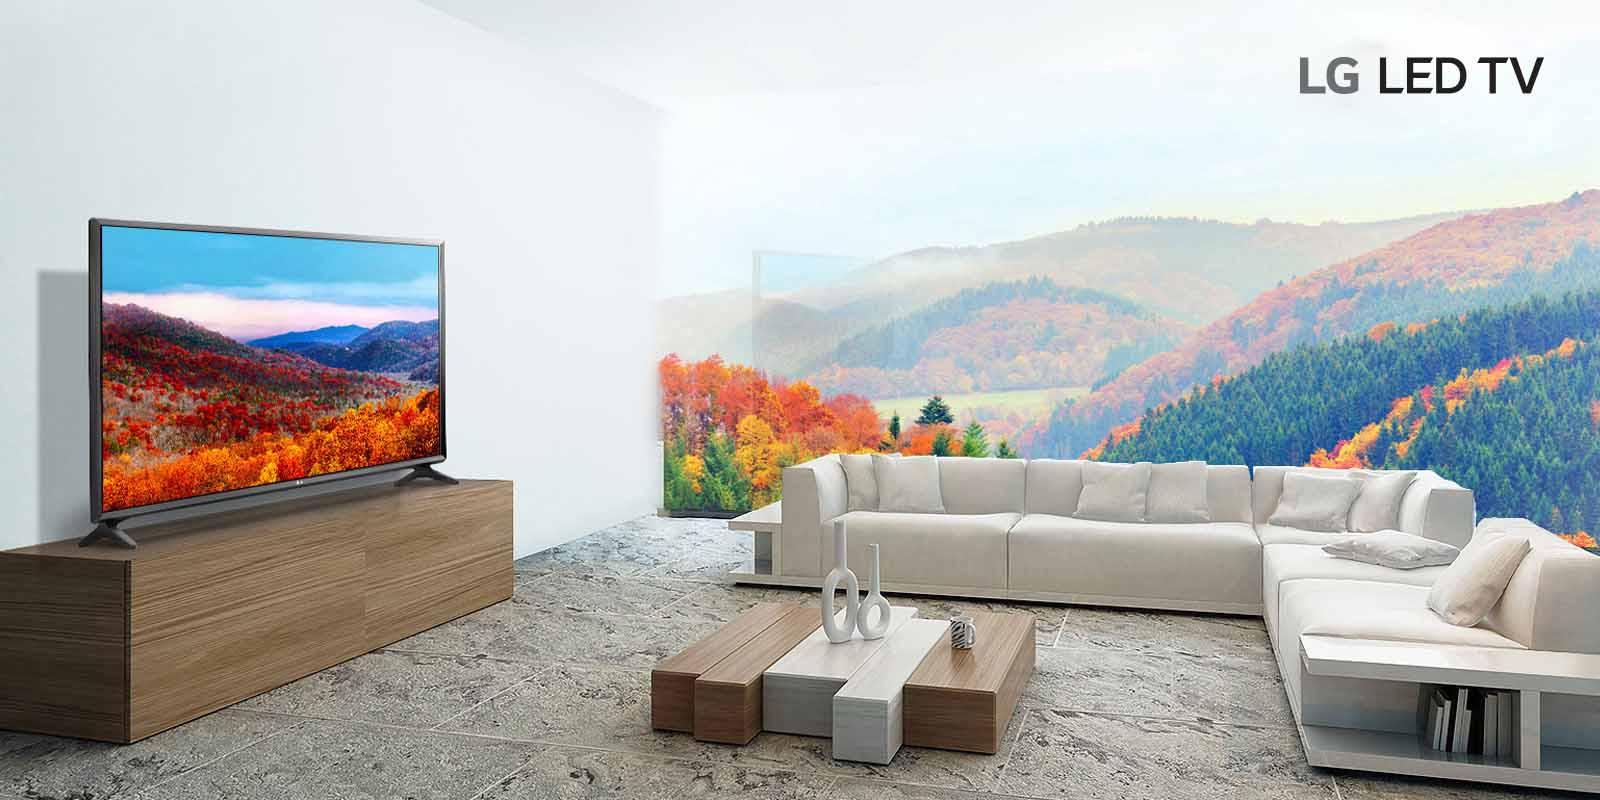 LG LED TV 1